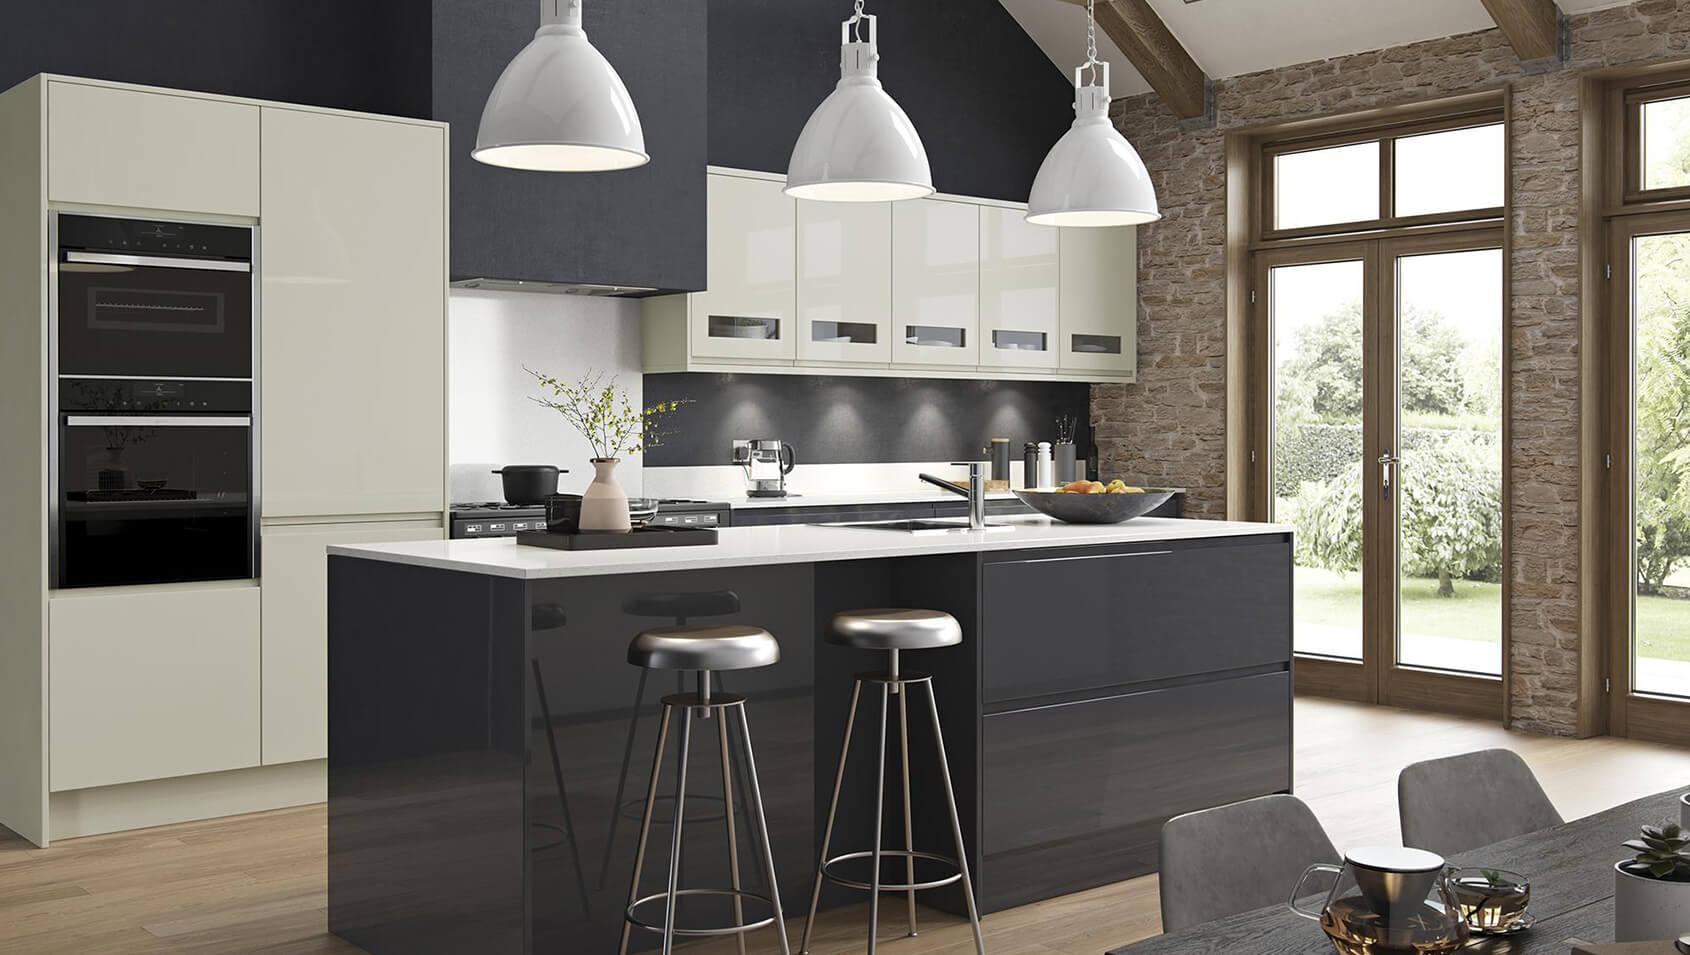 Finlay Kitchens, Wardrobes U0026 Interior Specialists, Galway.   Www ...